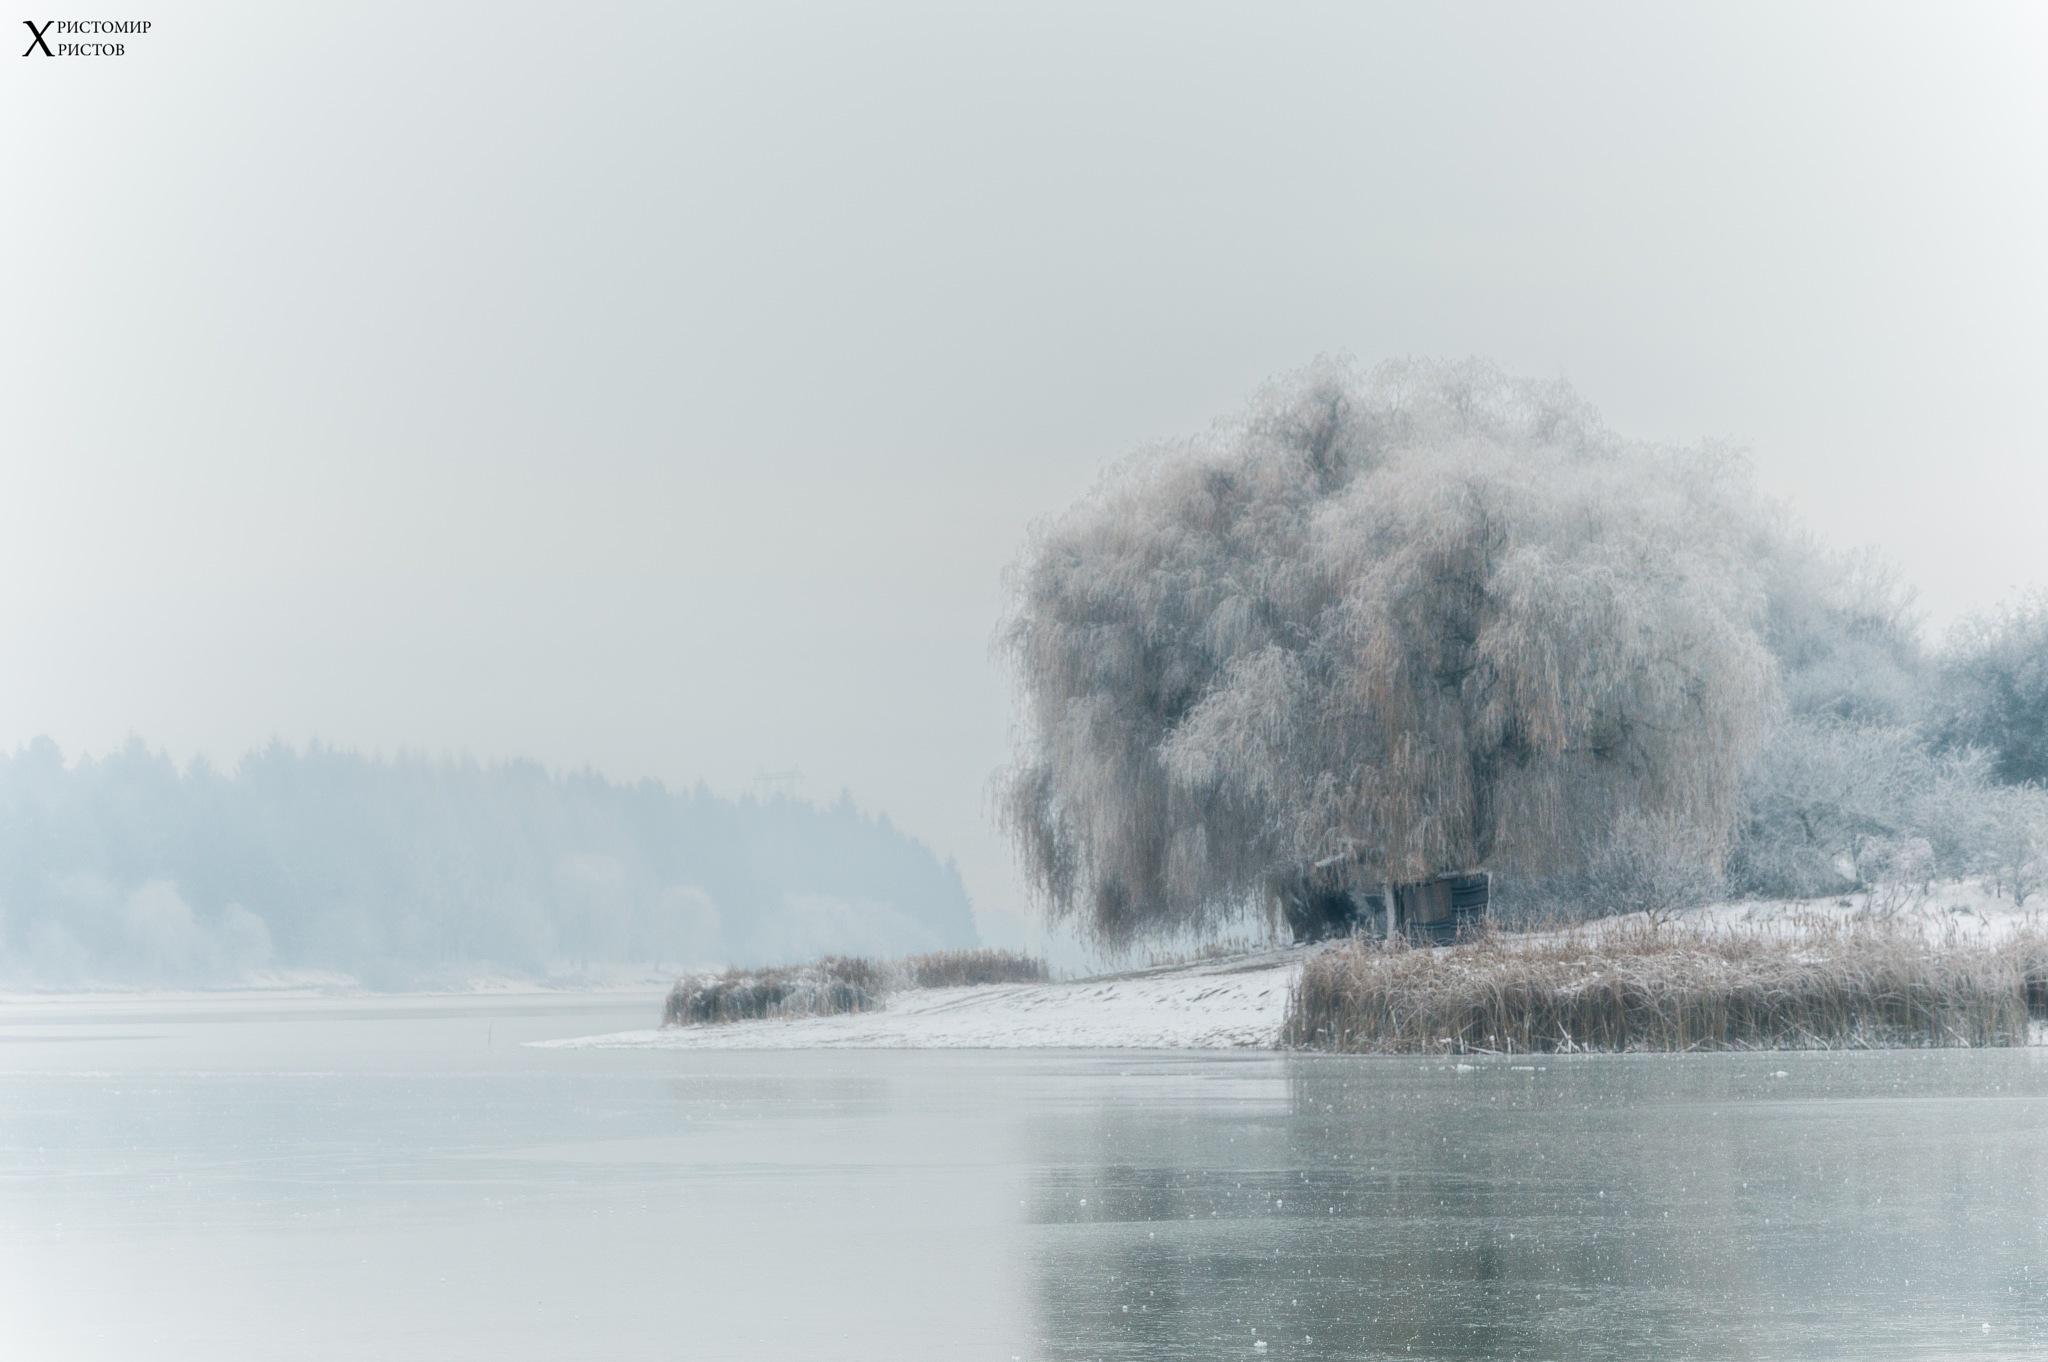 White Season by Hristomir Hristov